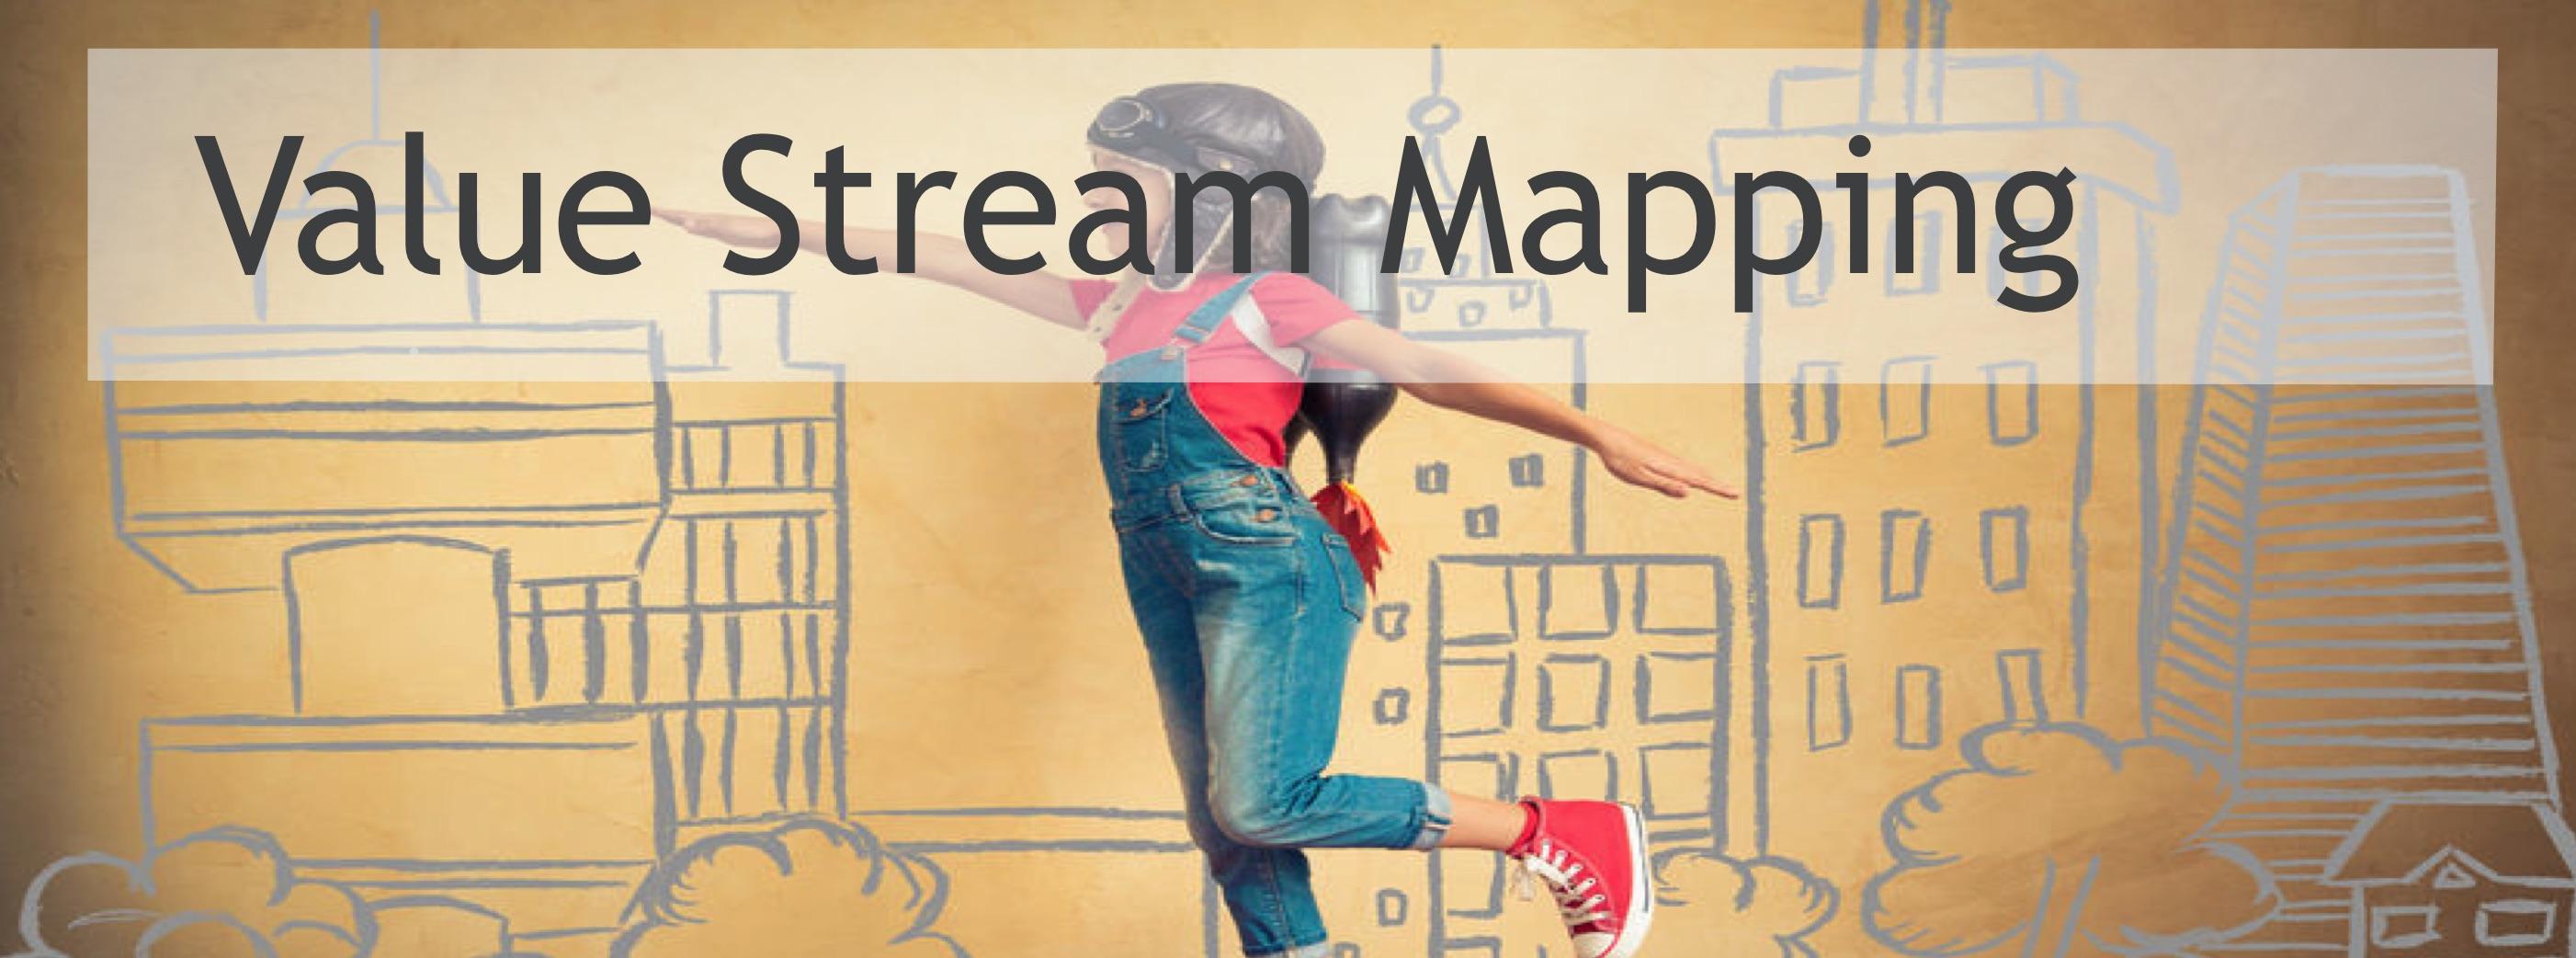 Value Stream Mapping Banner.jpg